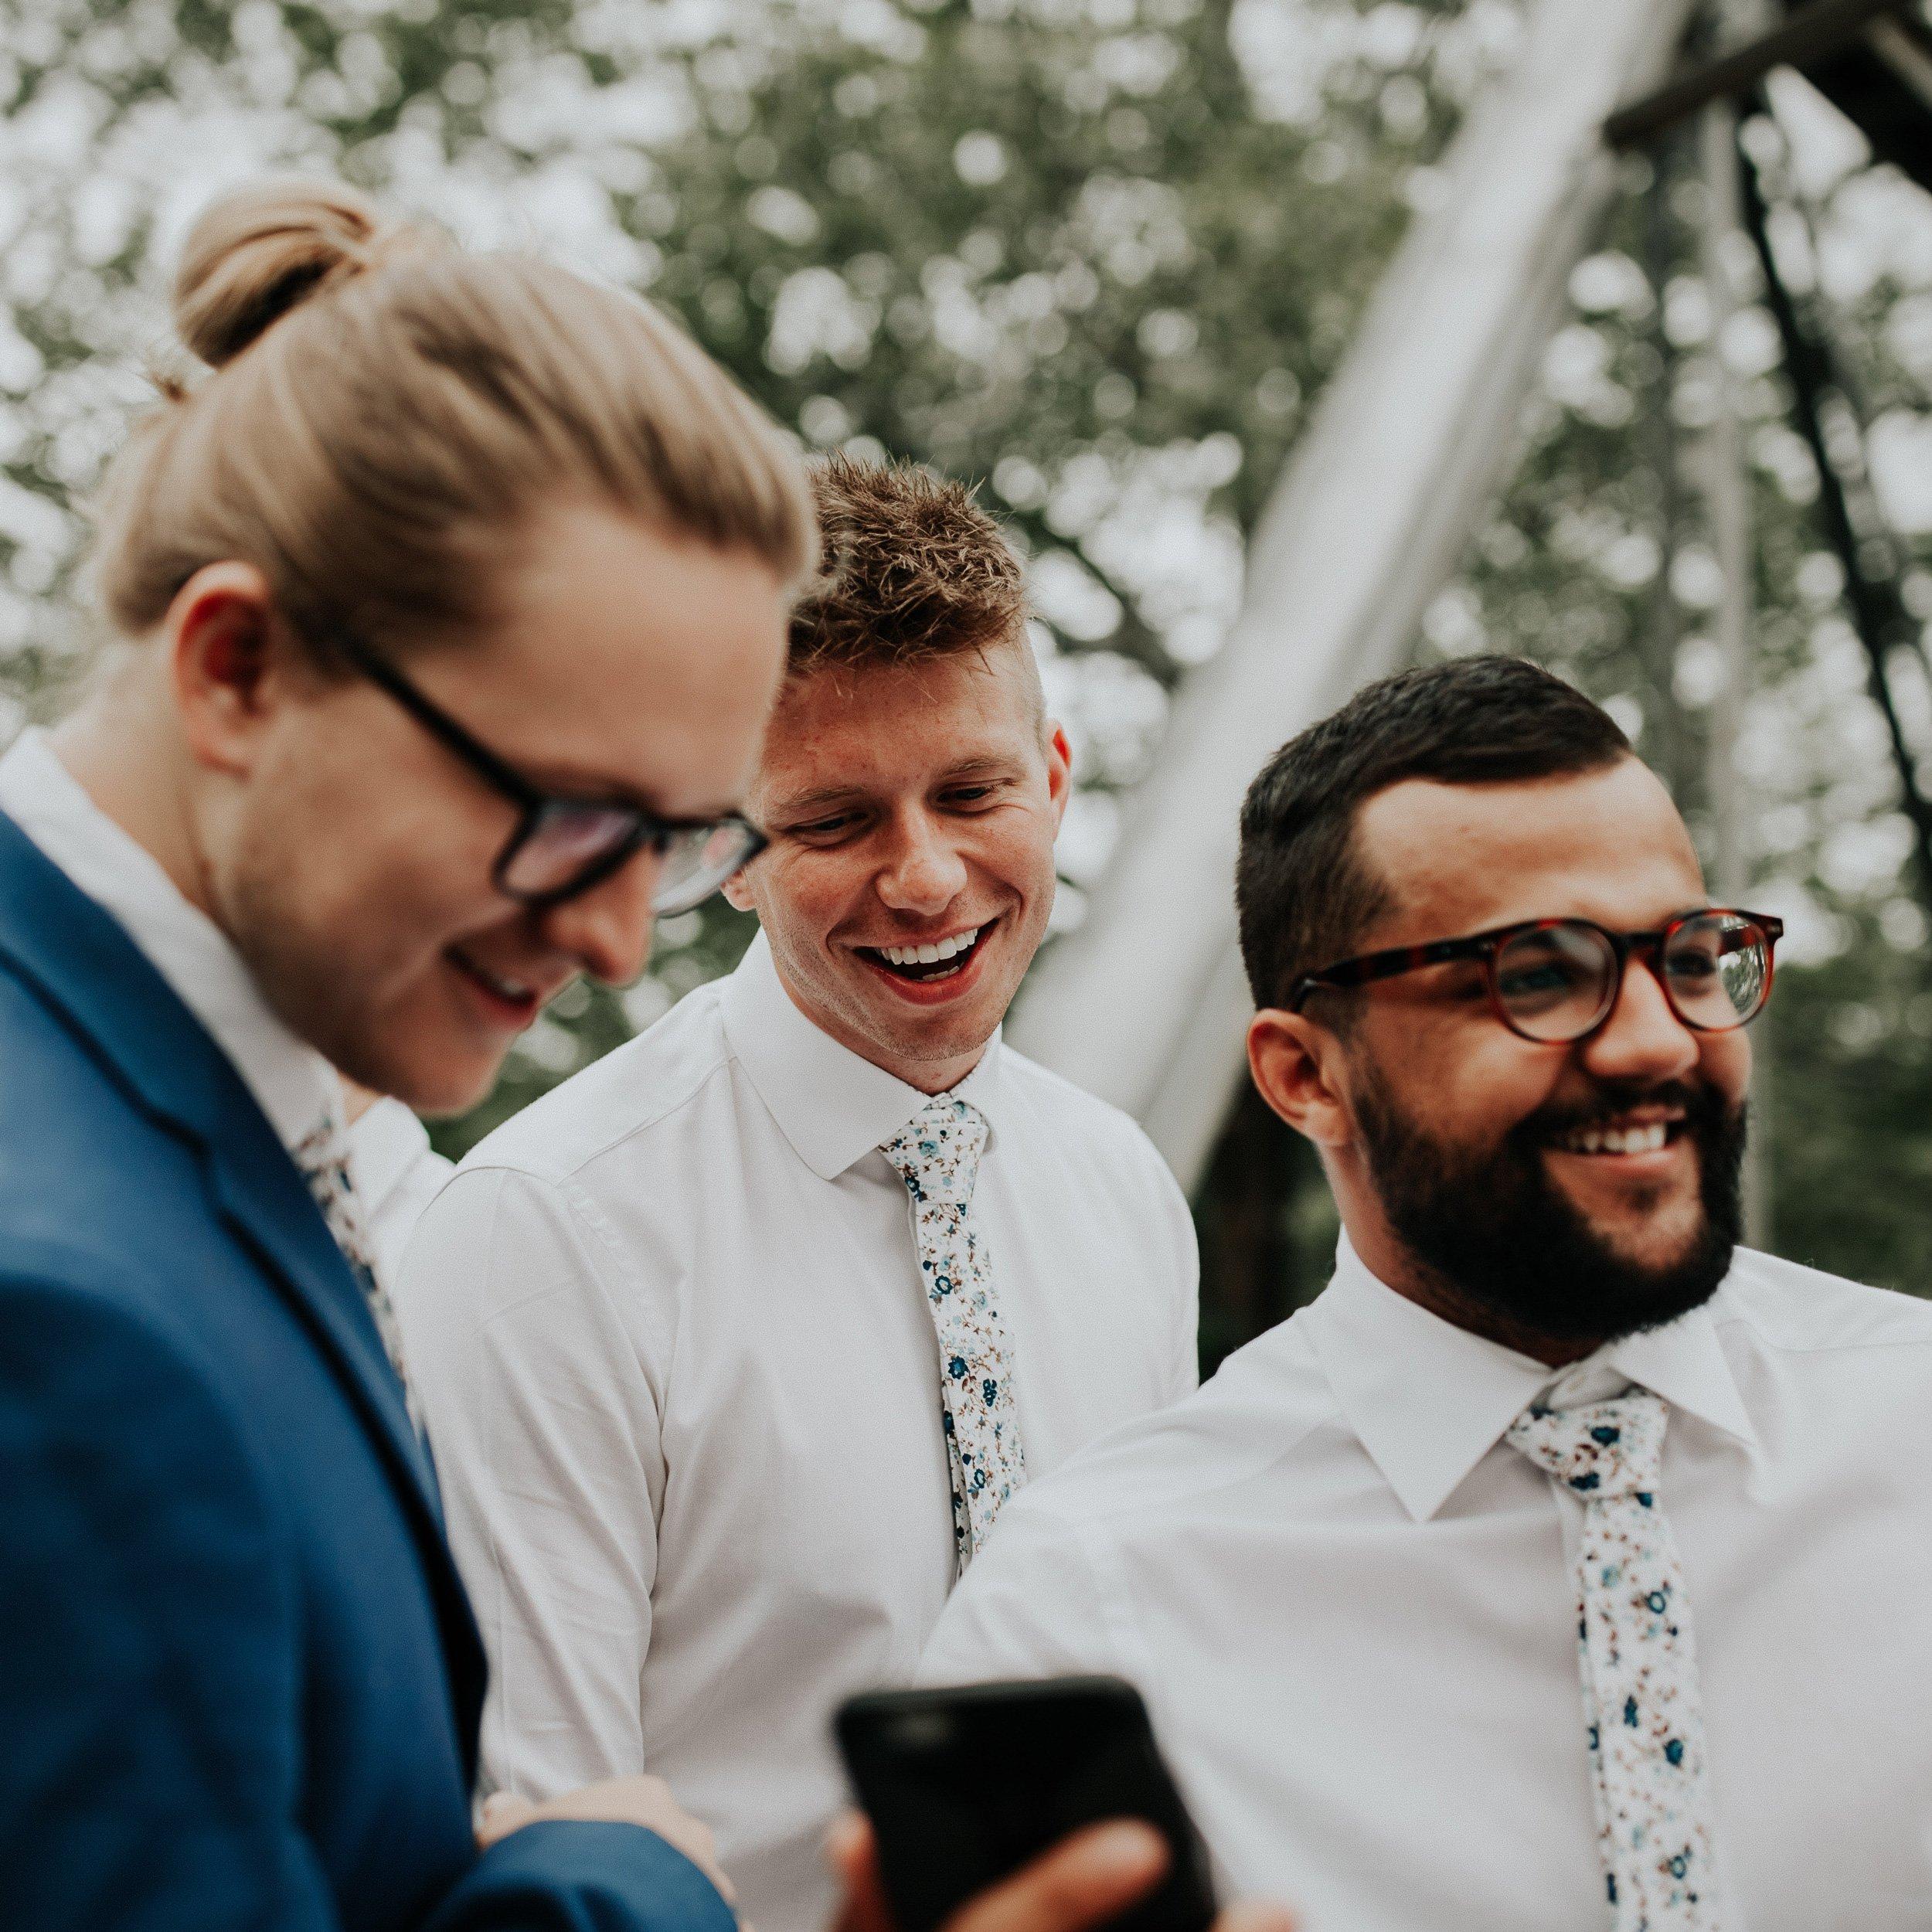 DAZI Men's Skinny Tie Floral Print Cotton Necktie, Great for Weddings, Groom, Groomsmen, Missions, Dances, Gifts. (Blue Bloom) by DAZI (Image #3)